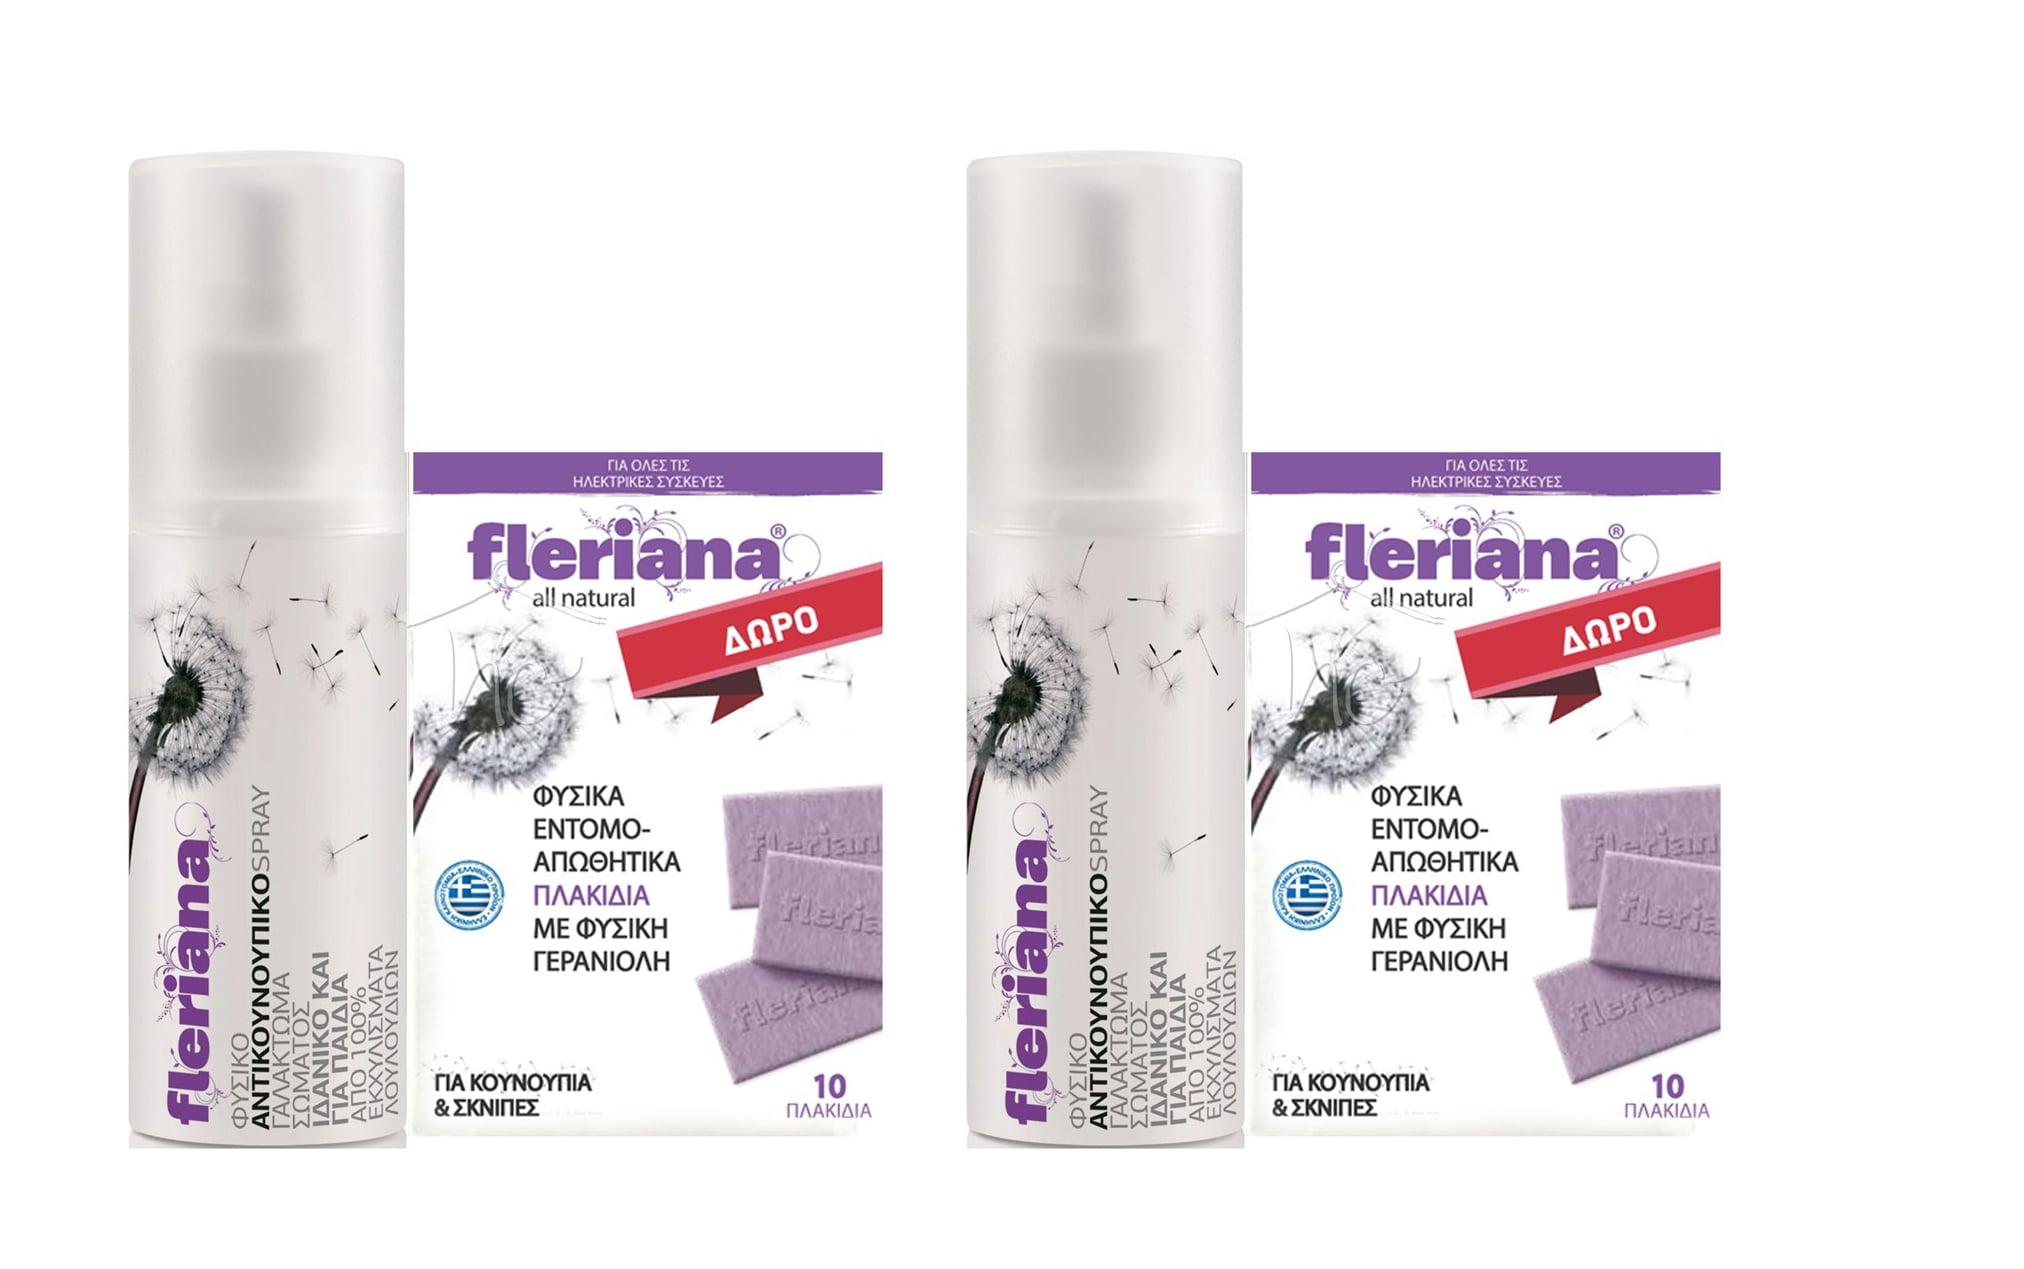 2 x Power Health Fleriana Spray Mosquito Repellent, 2 x 100ml & GIFT 2 x Power Health Fleriana Mosquito Repellent, 2 x 10 tablets